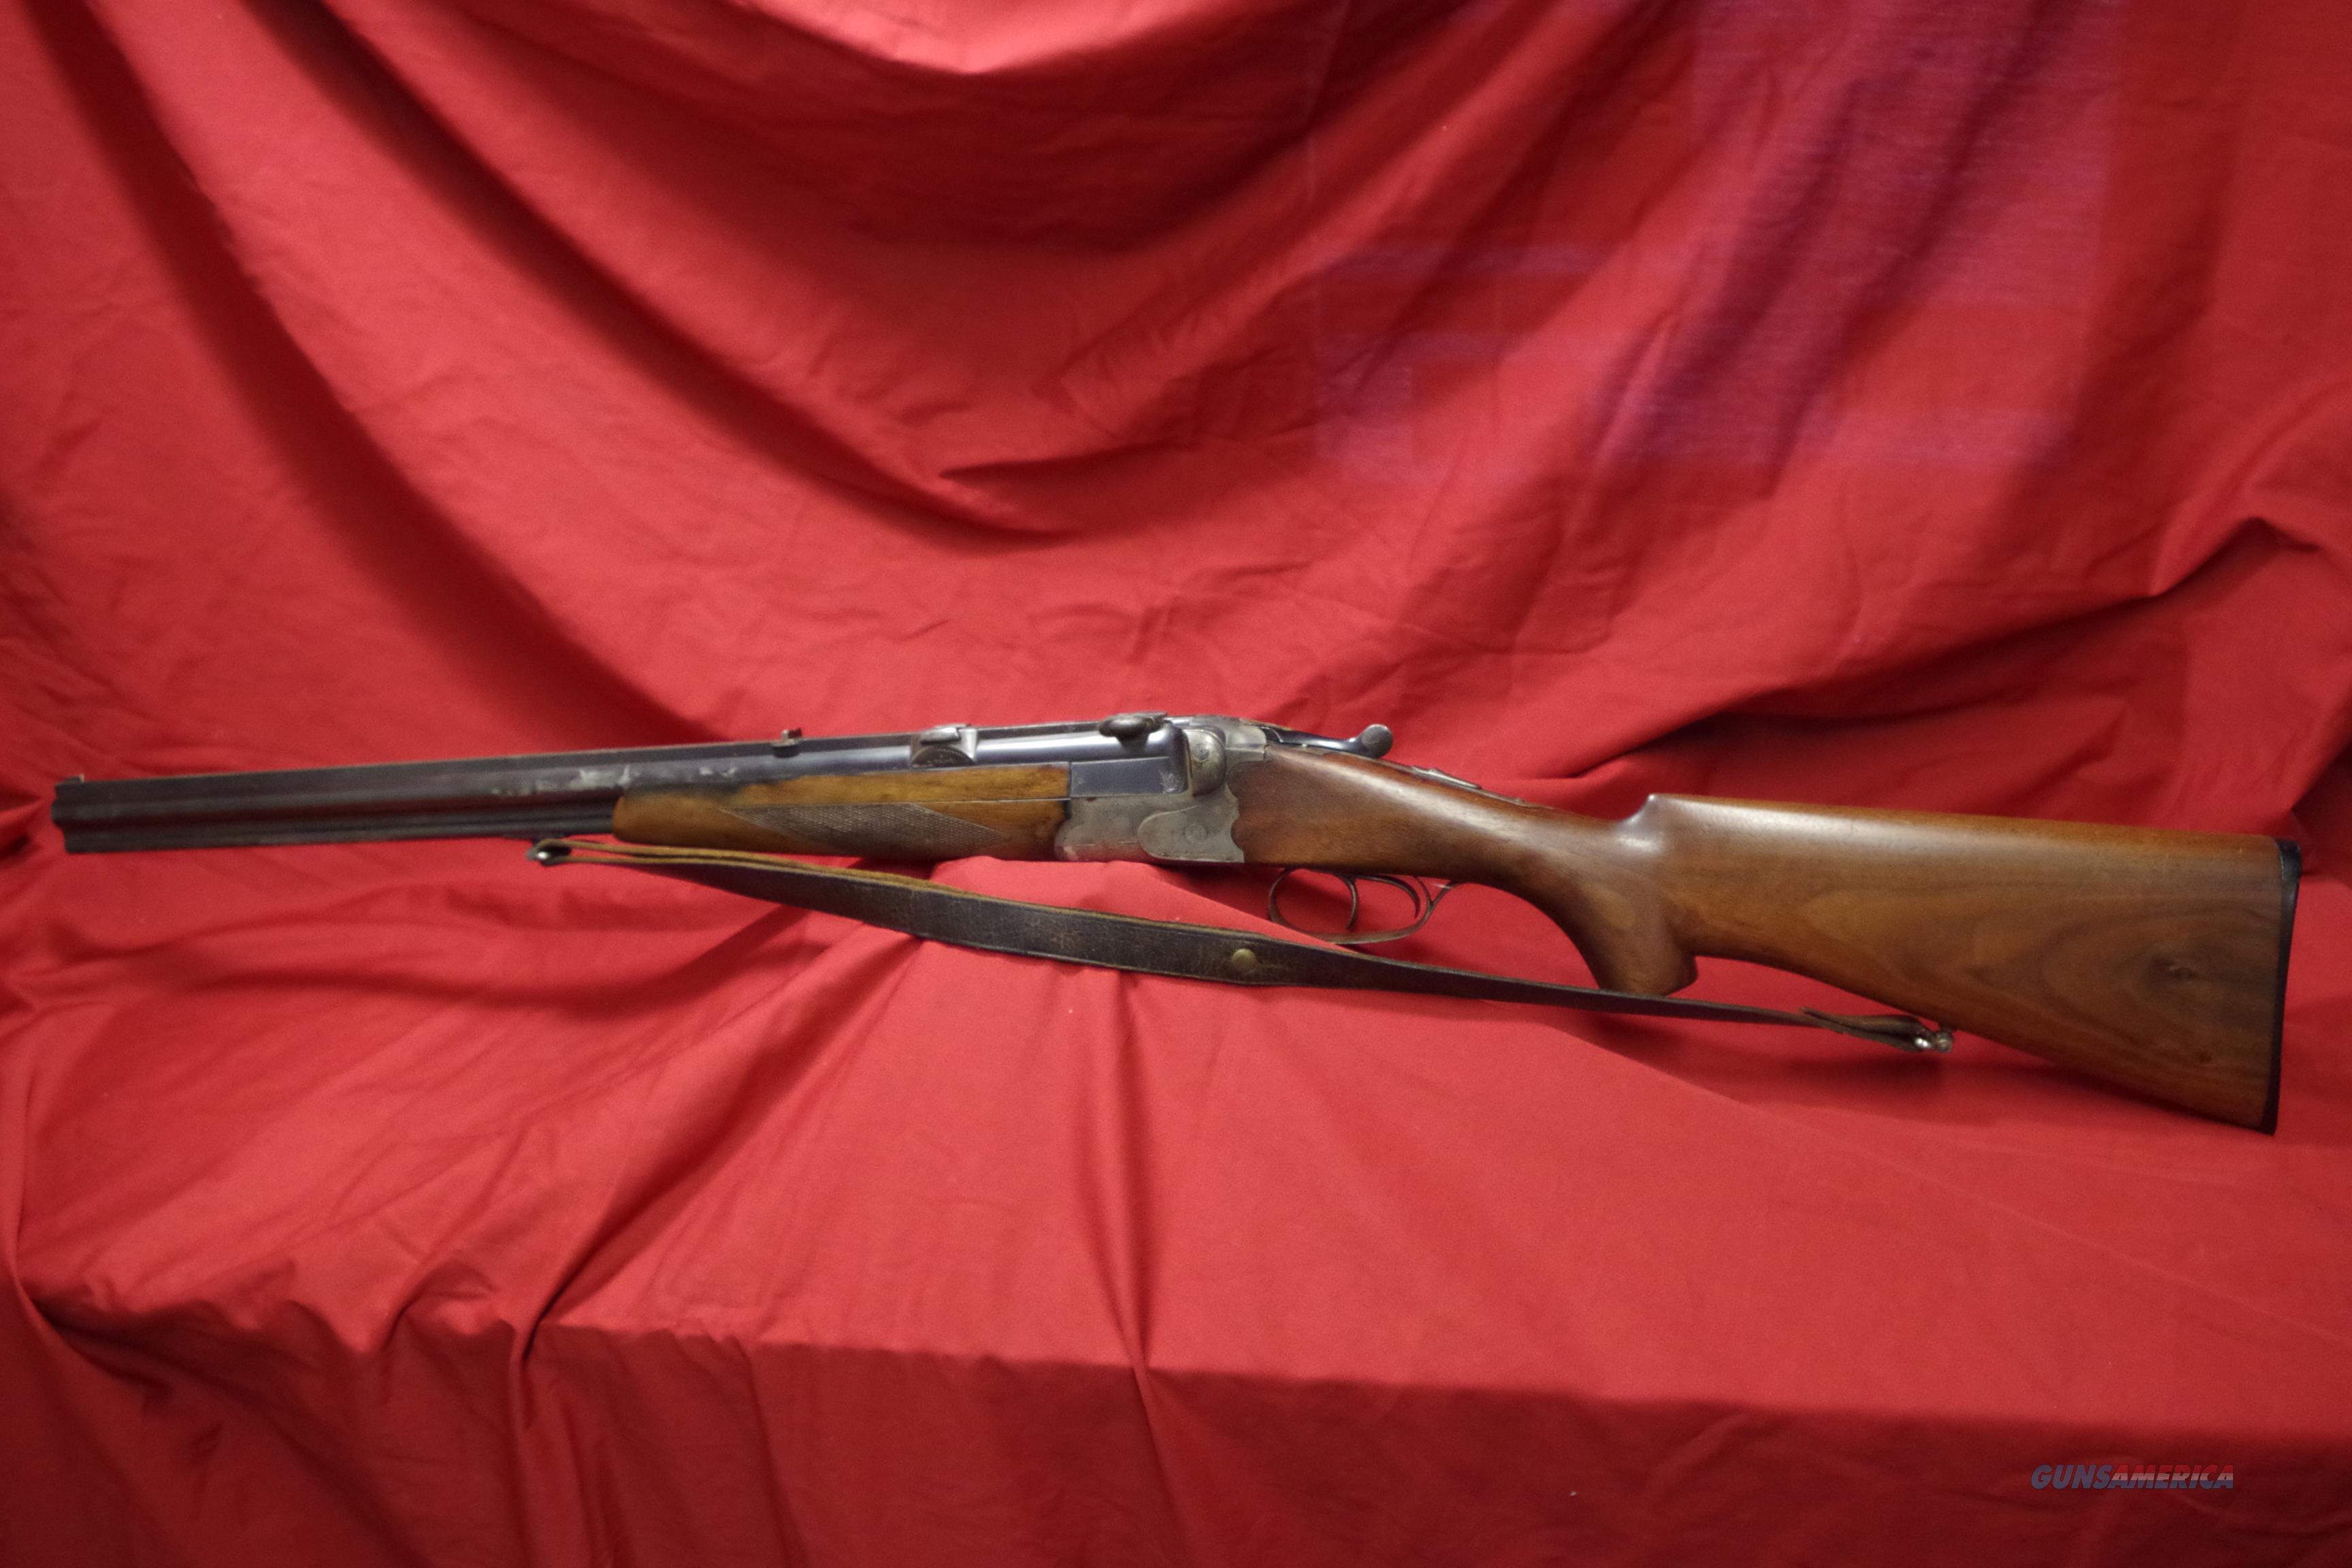 J.P.Sauer & Suhn Krupp 16 ga over 6.5 x 57R   Guns > Rifles > J.P. Sauer Rifles